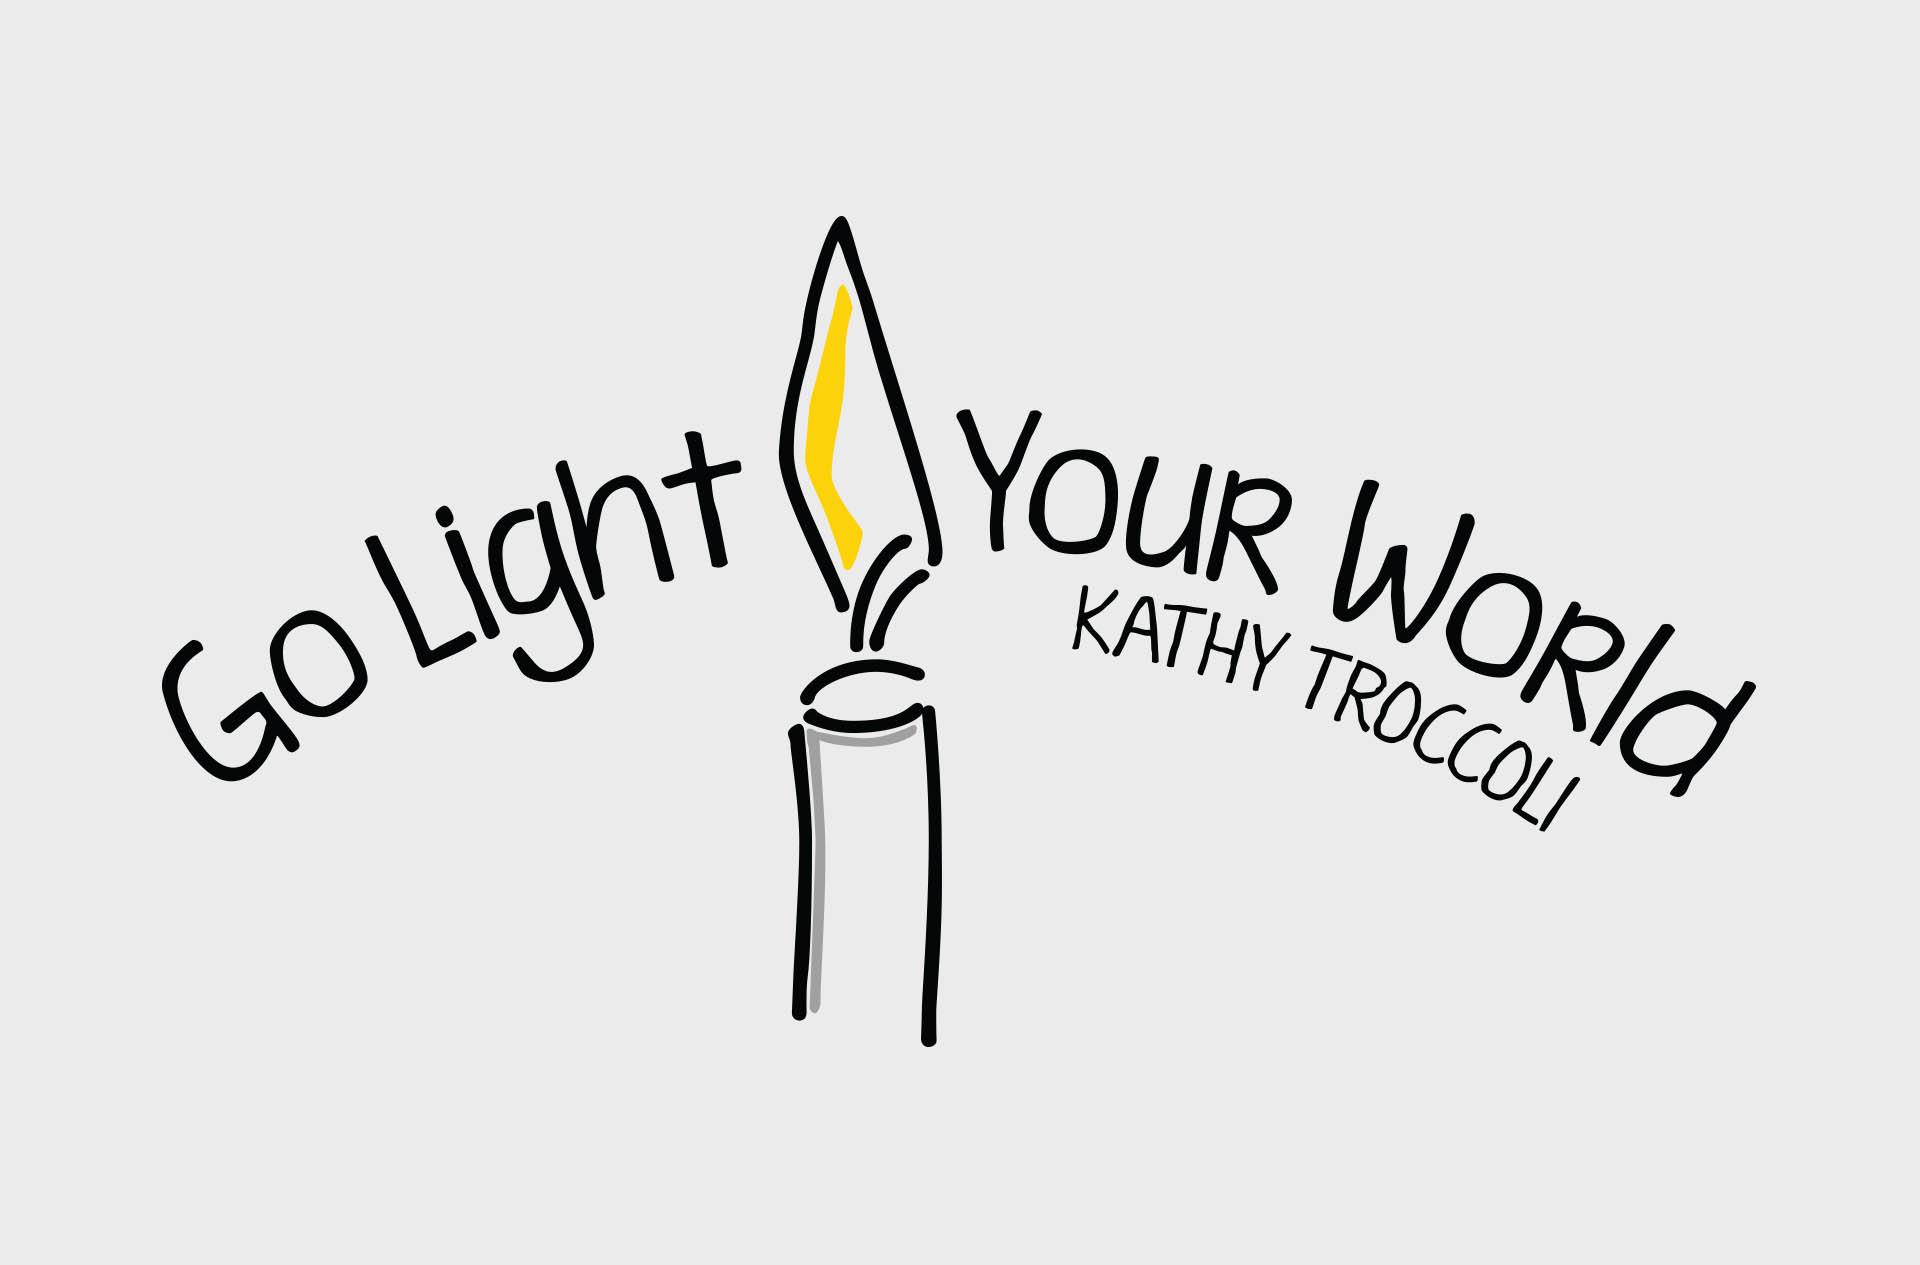 Kathy Troccoli's Go Light Your World Logo